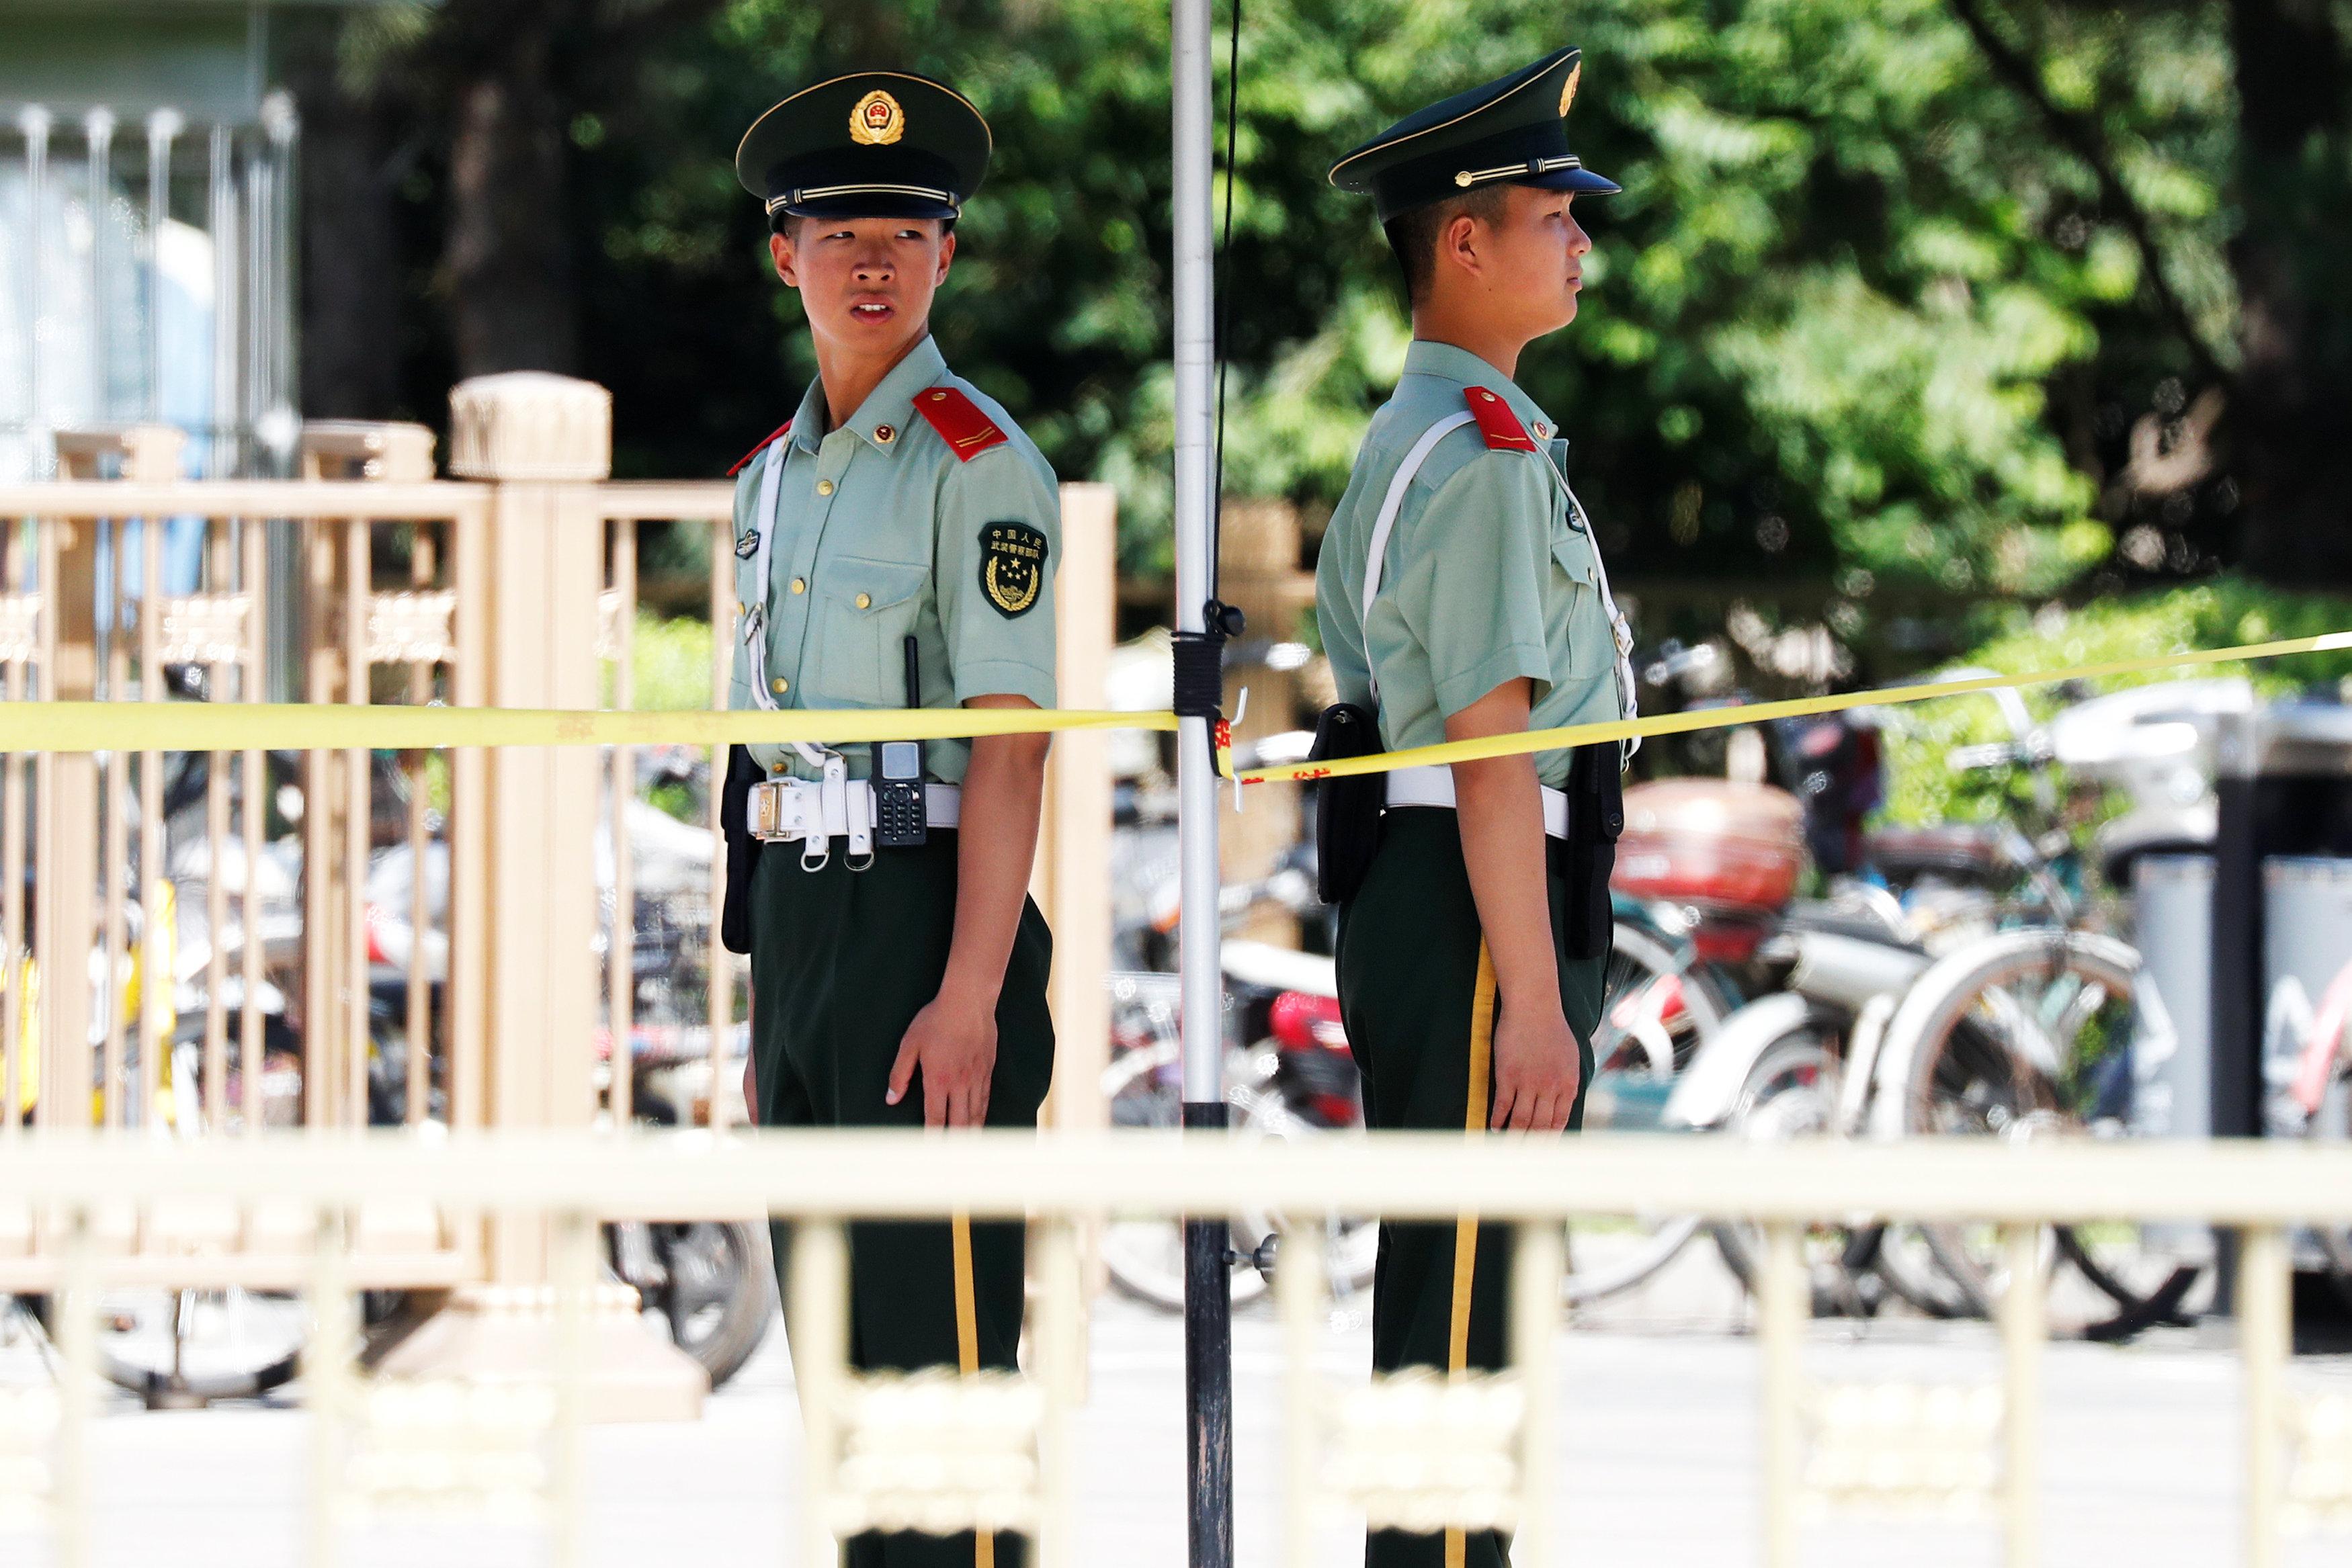 Paramilitary policemen take position near Beijing's Tiananmen Square, China June 4, 2018. REUTERS/Damir Sagolj